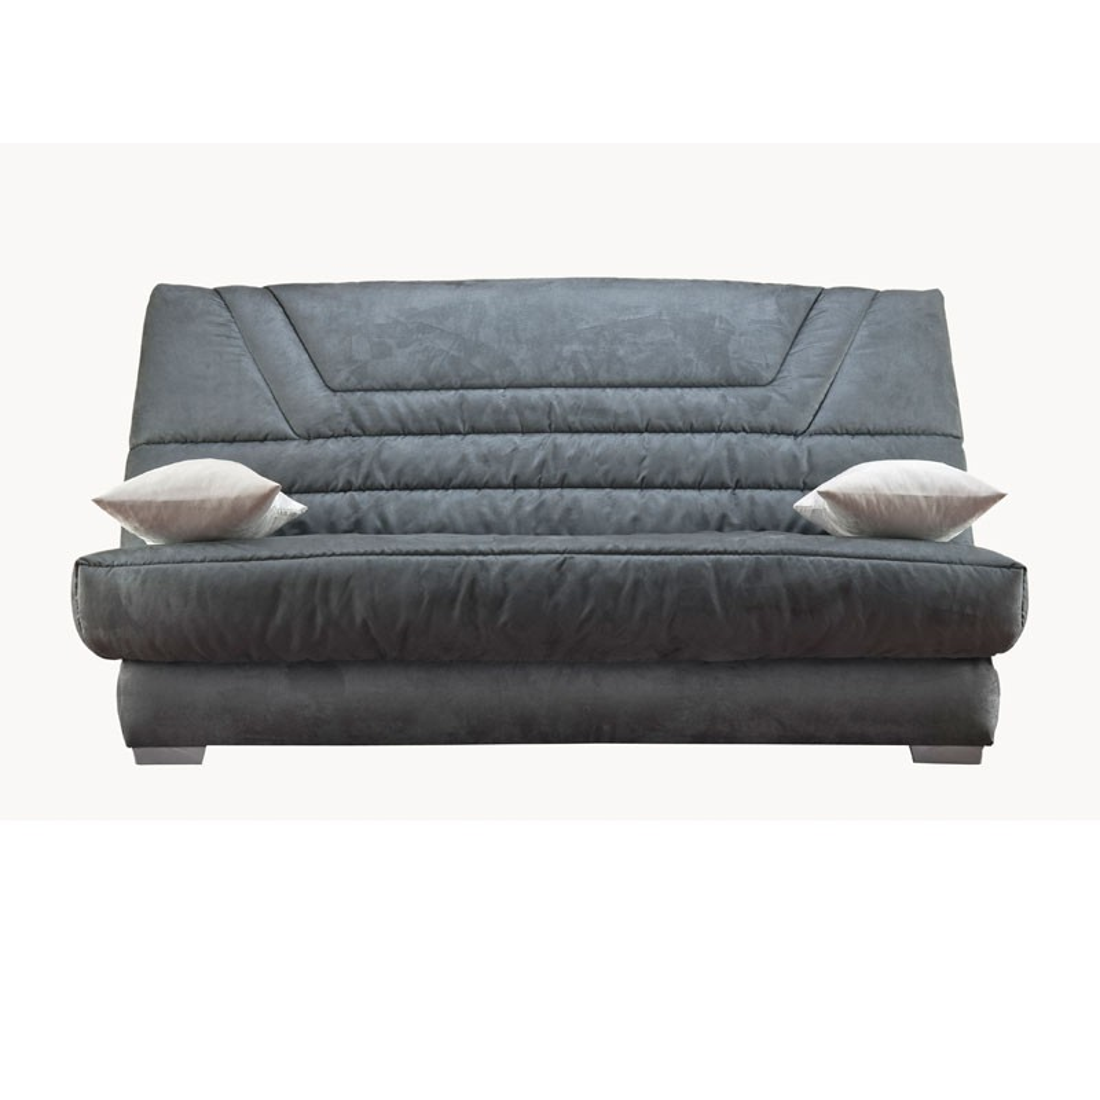 banquette lit clic clac tisgris matelas bultex 140 cm speed bria n 2. Black Bedroom Furniture Sets. Home Design Ideas